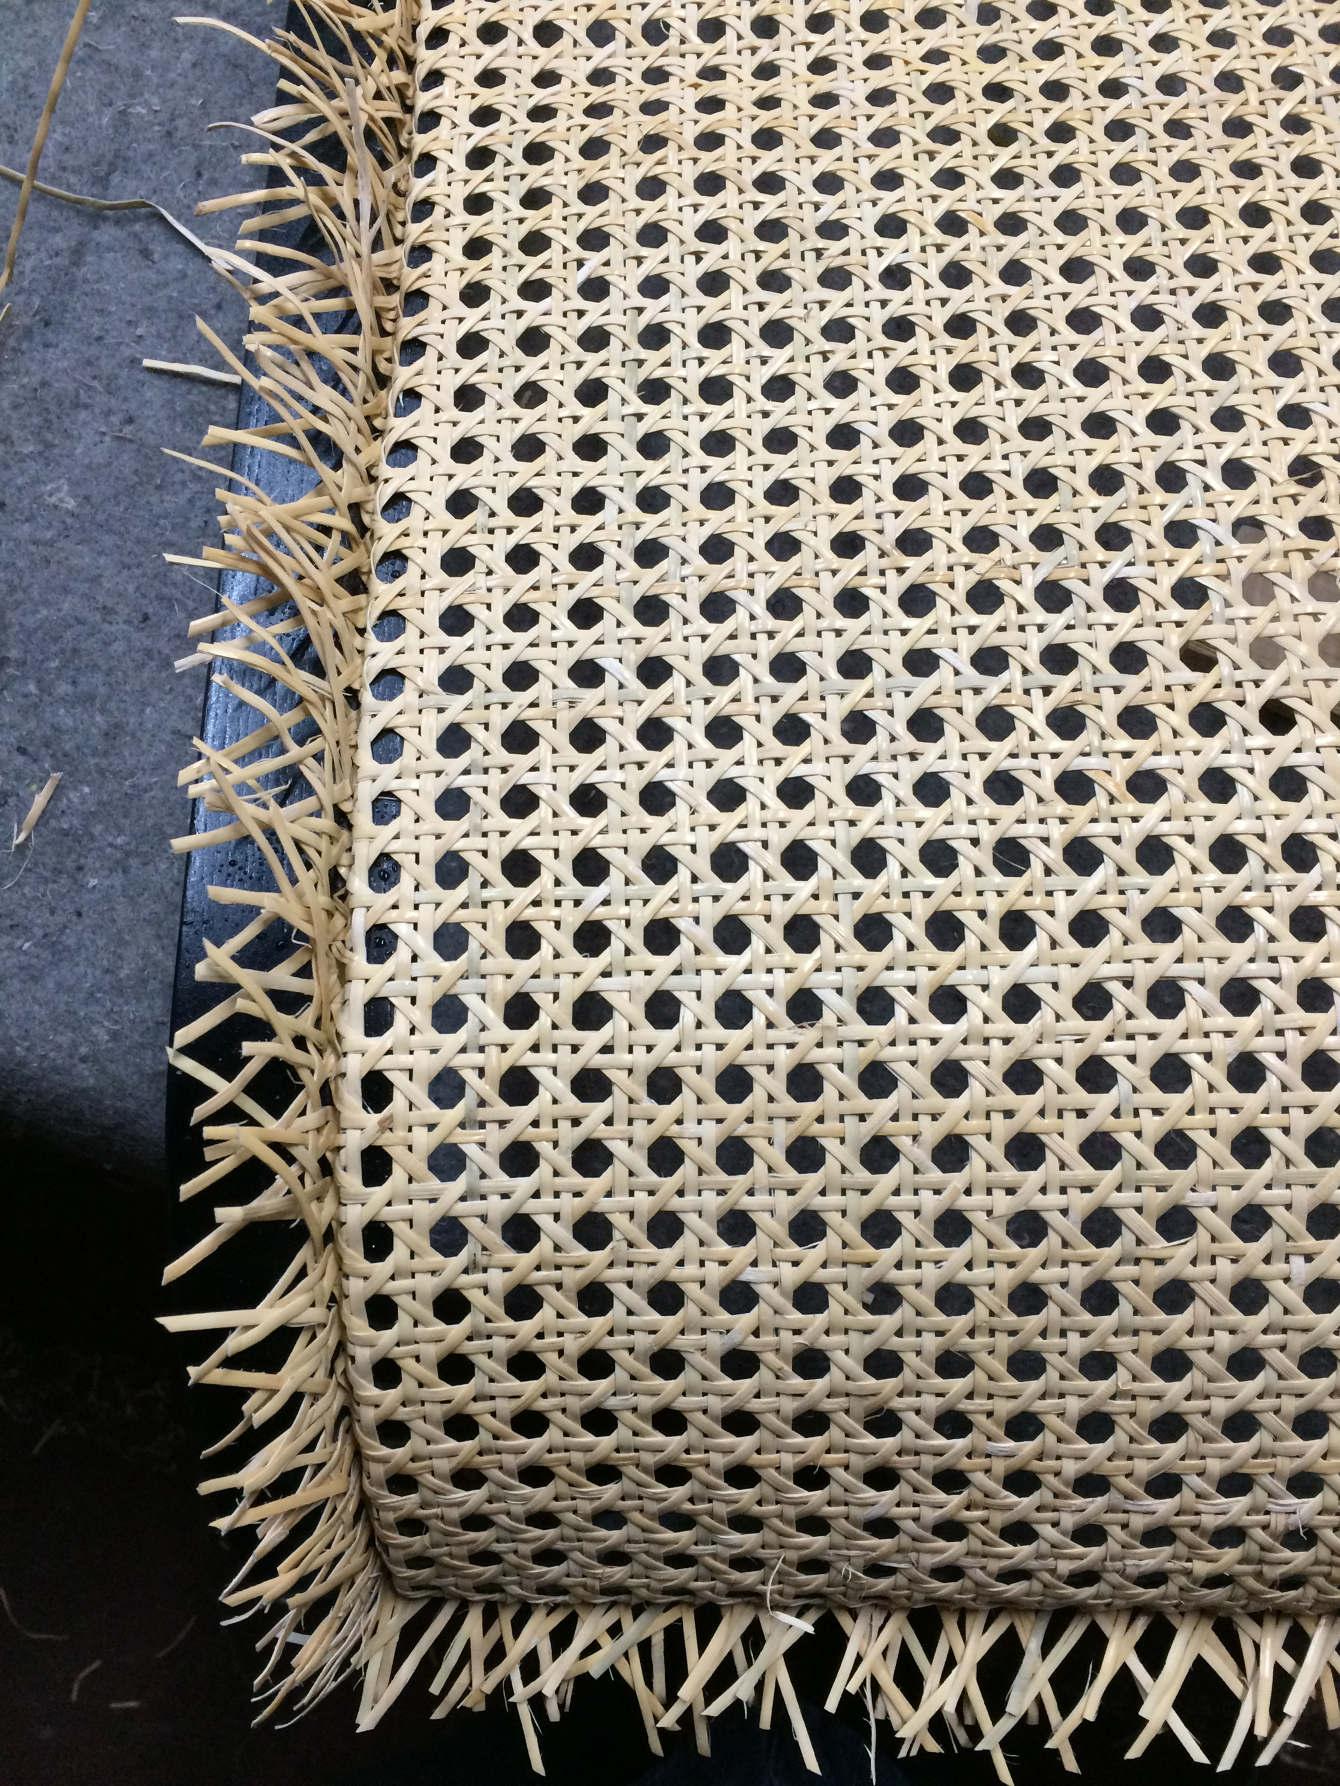 Phenomenal Caning And Cording Ar Leaman Creativecarmelina Interior Chair Design Creativecarmelinacom